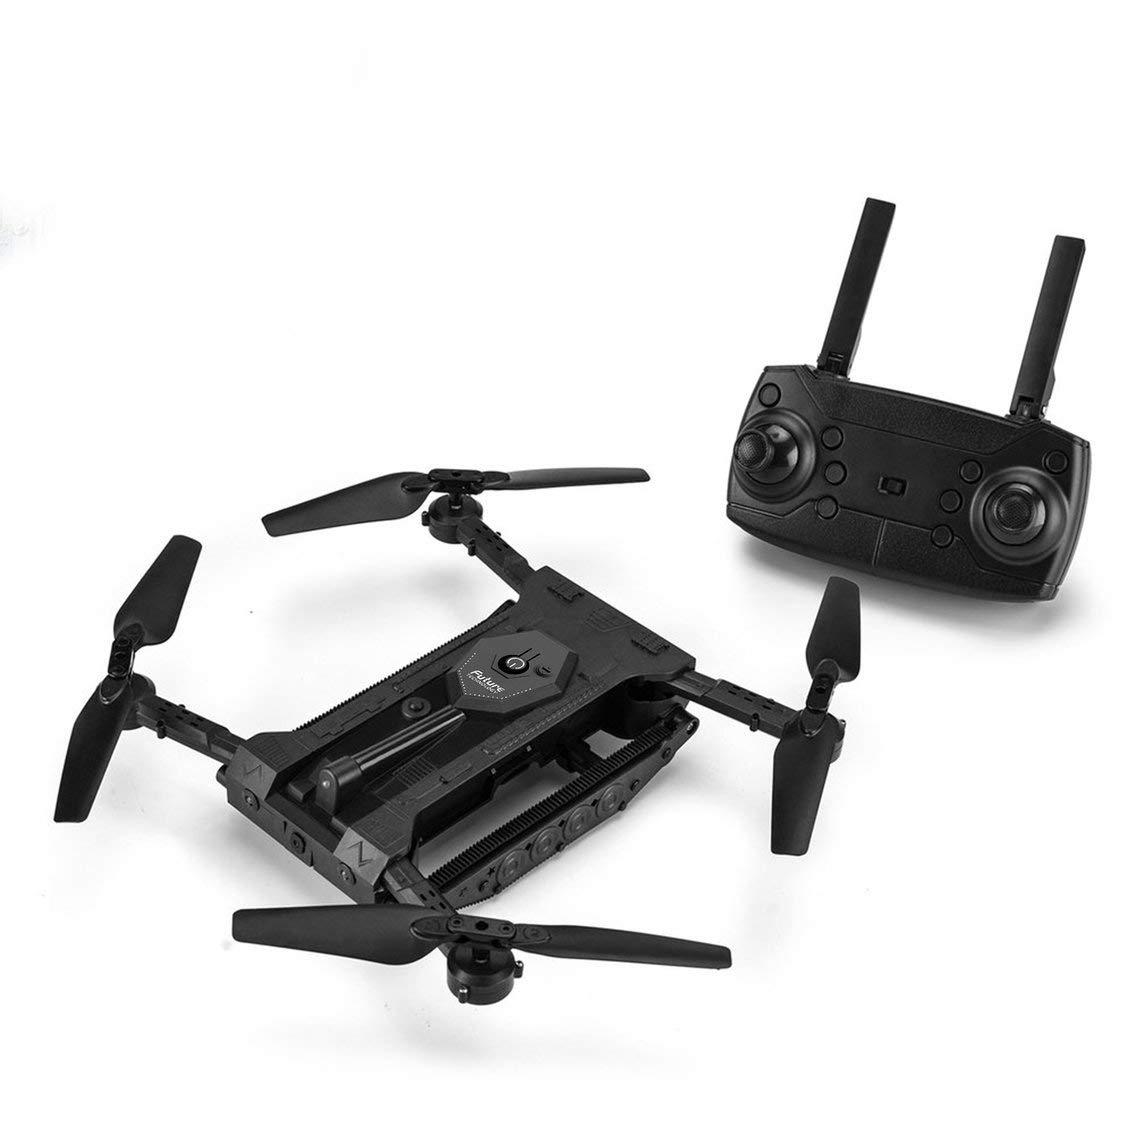 Footprintse R5 Faltbare RC Fliegende Auto Drohne Quadcopter Flugzeuge UAV mit 720P HD WiFi FPV Kamera 16 Minuten Langer Flug Höhenstand halten